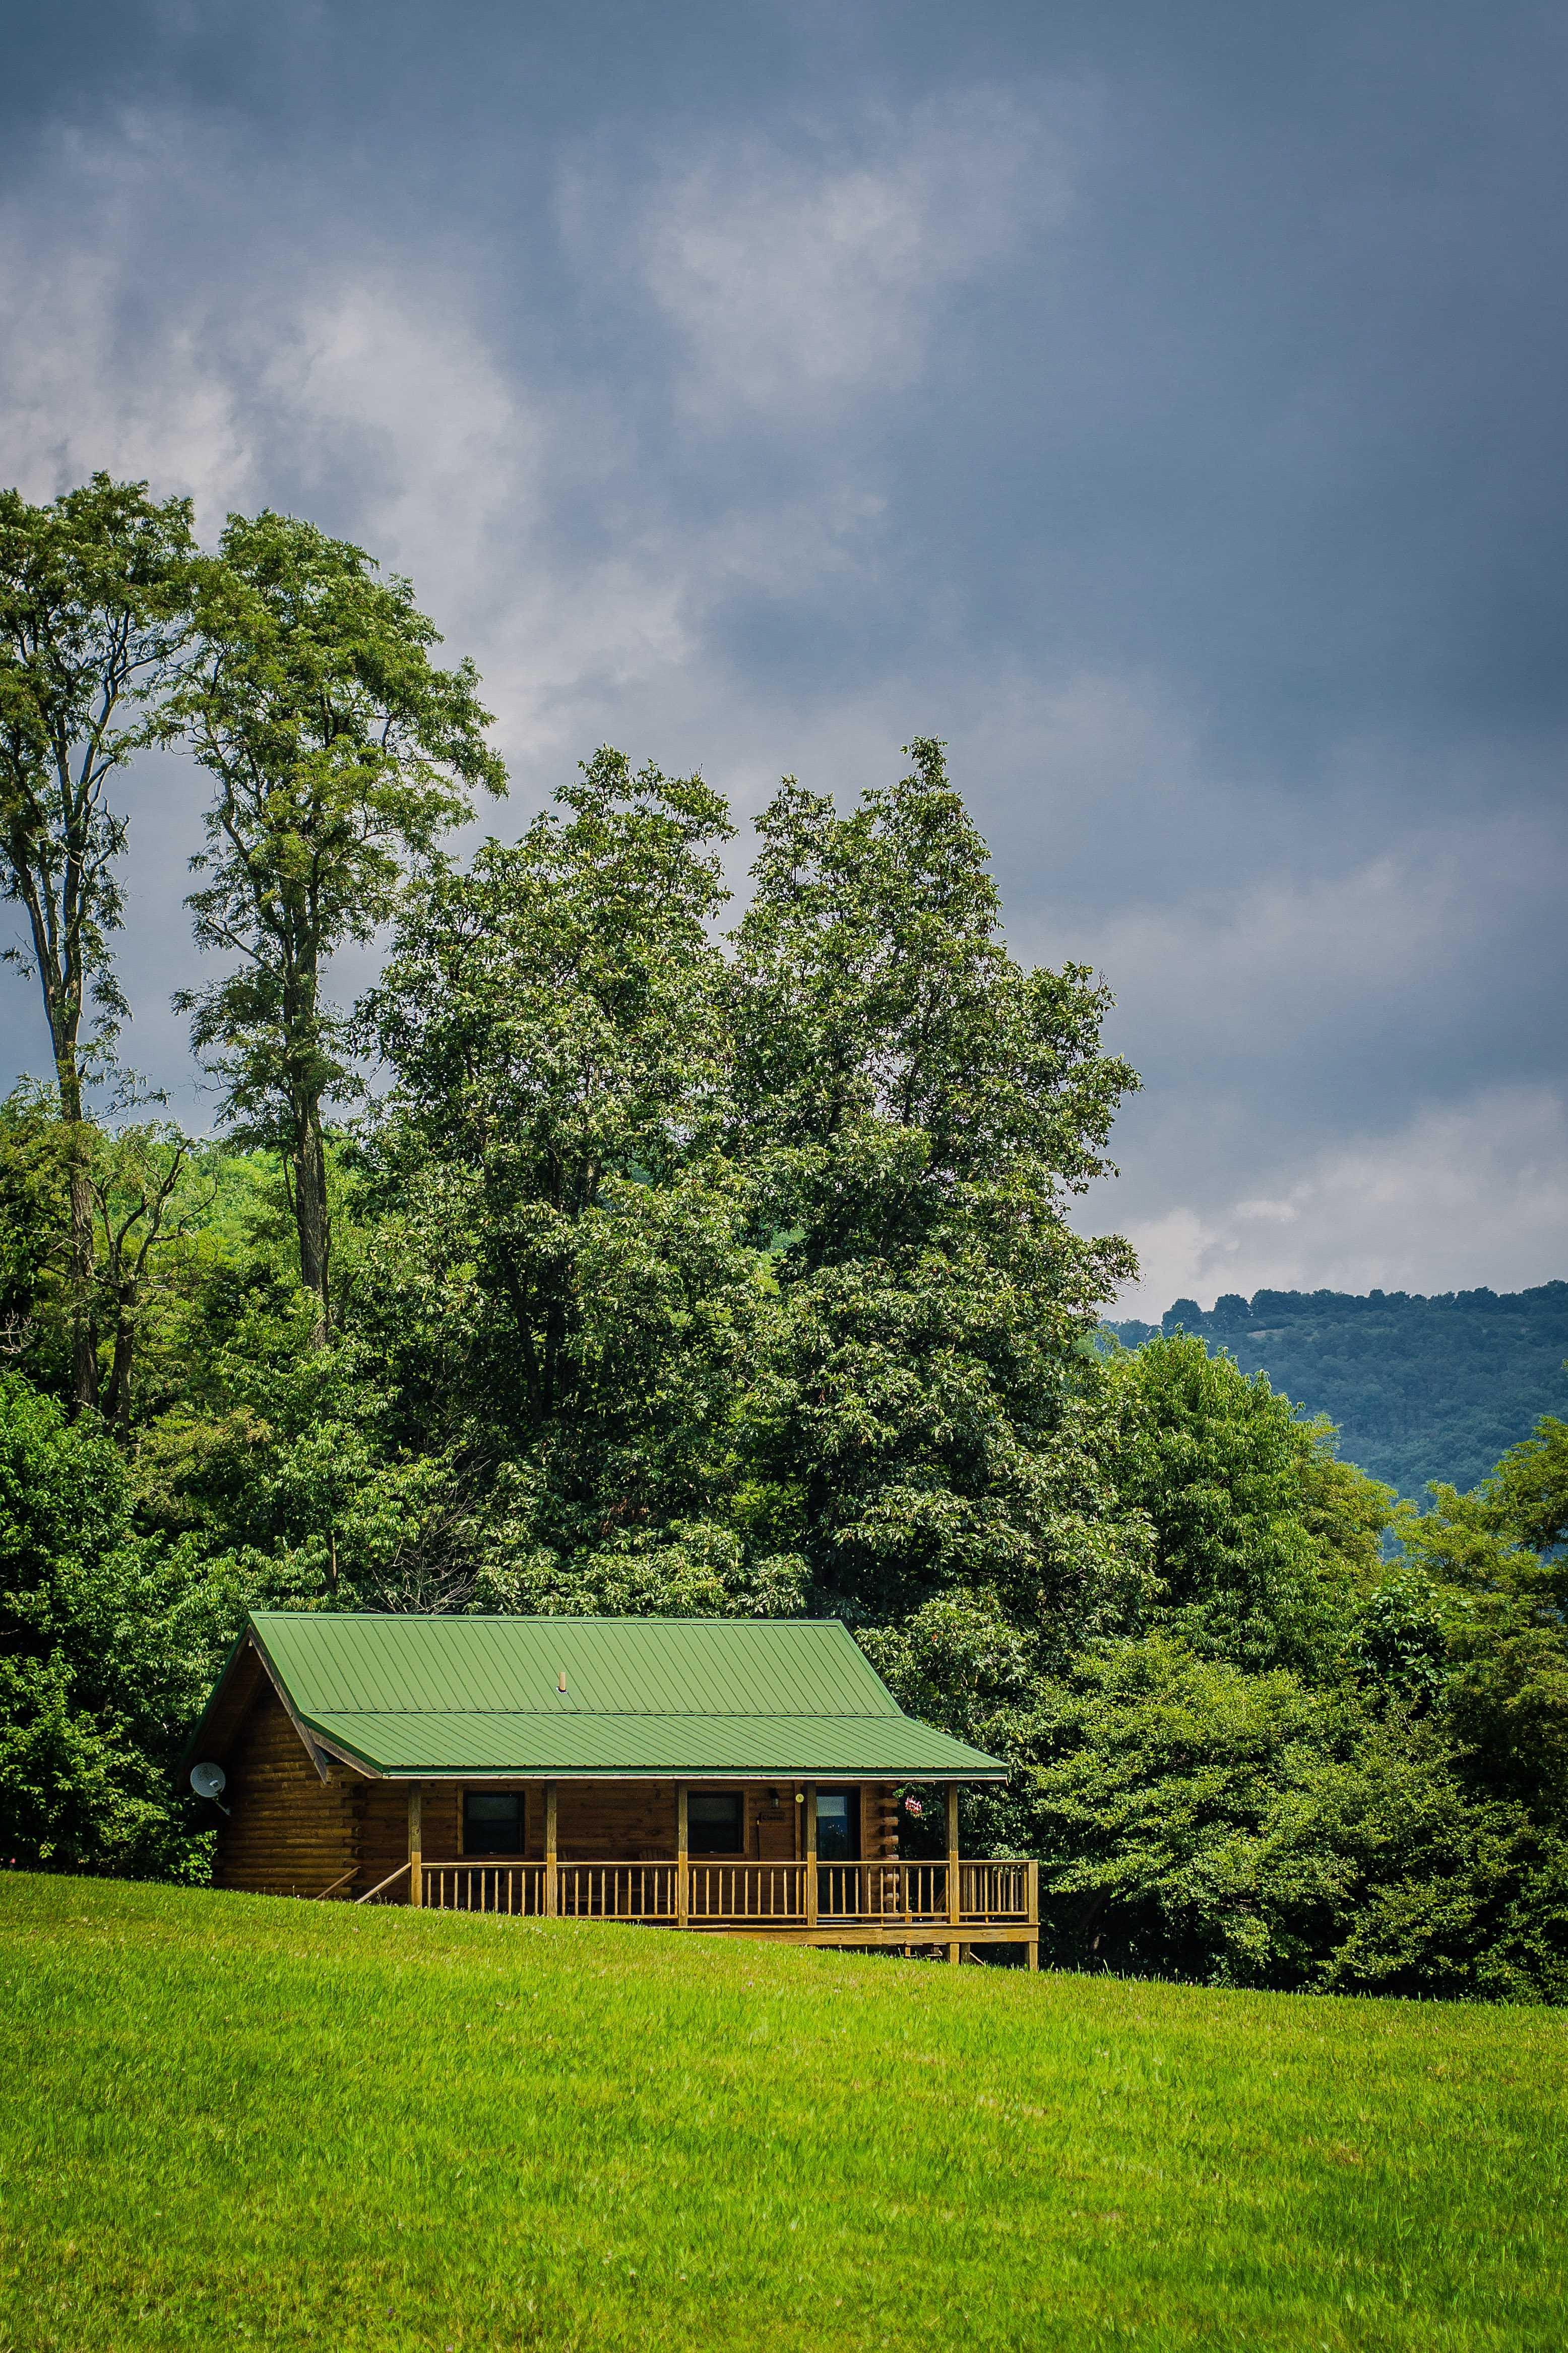 Honeymoon cabin rentals honeymoon cabin rentals wv for South carolina honeymoon cabins